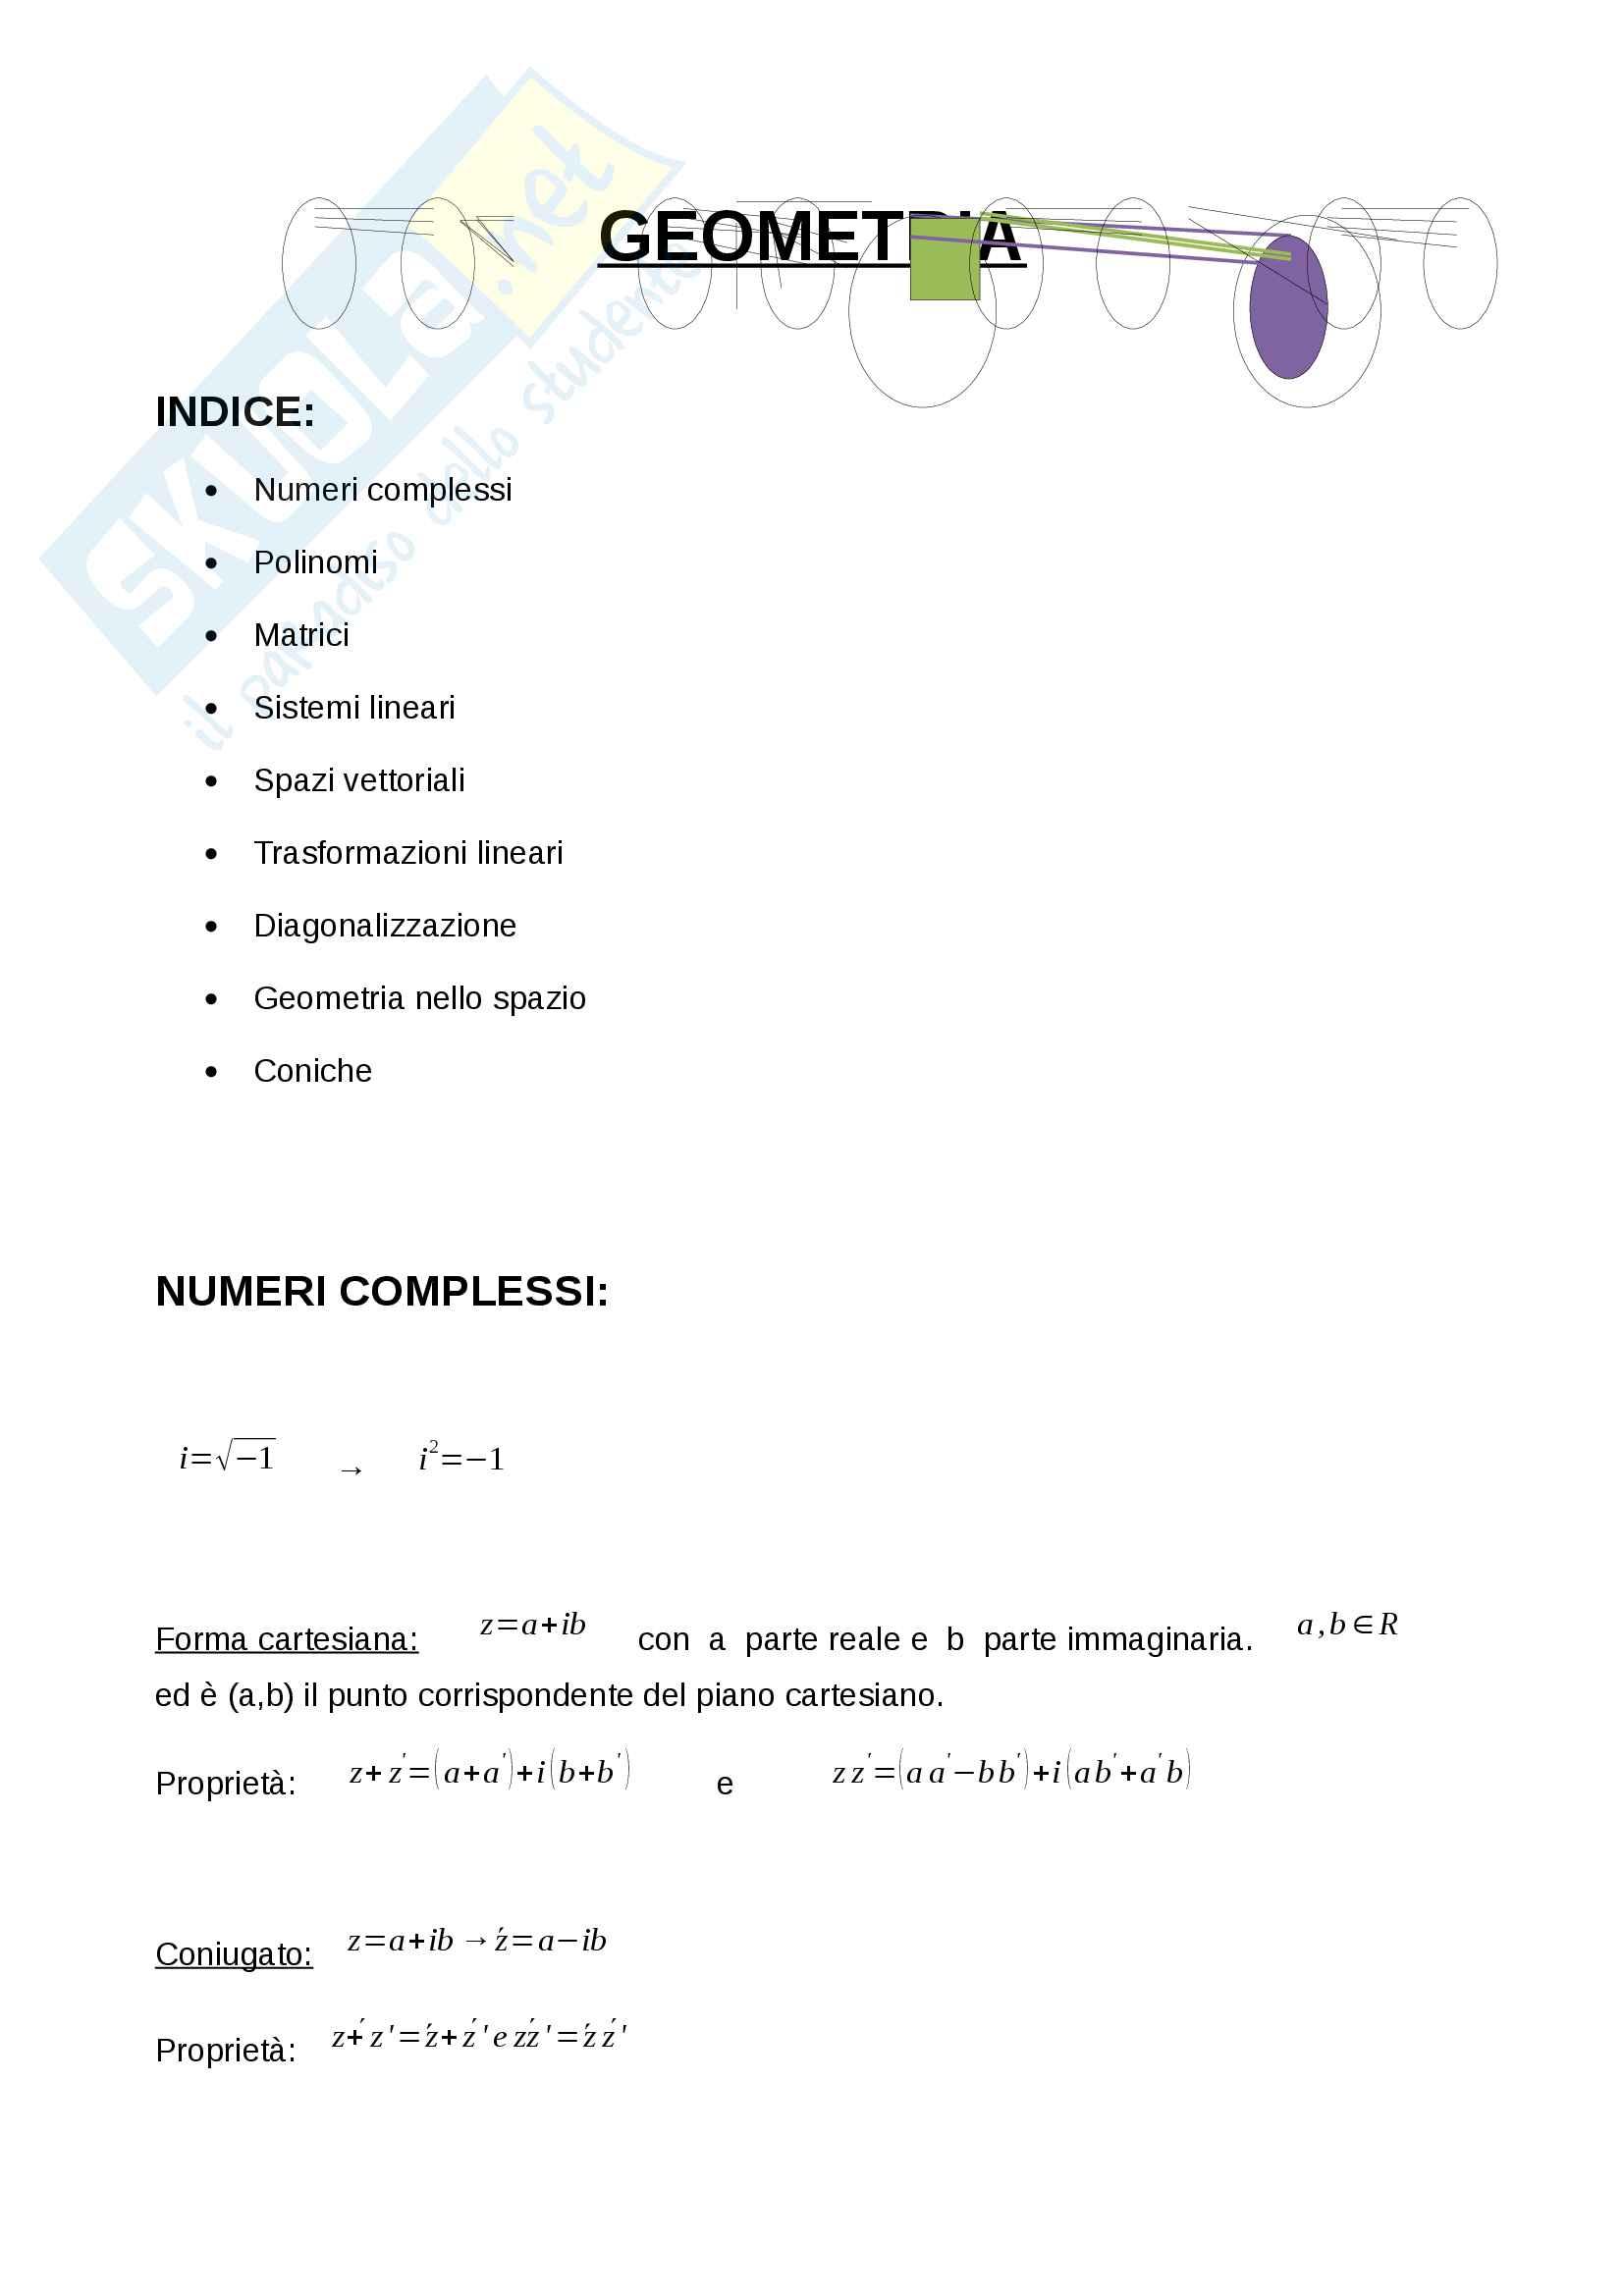 Appunti di Geometria UniGe (Catalisano)